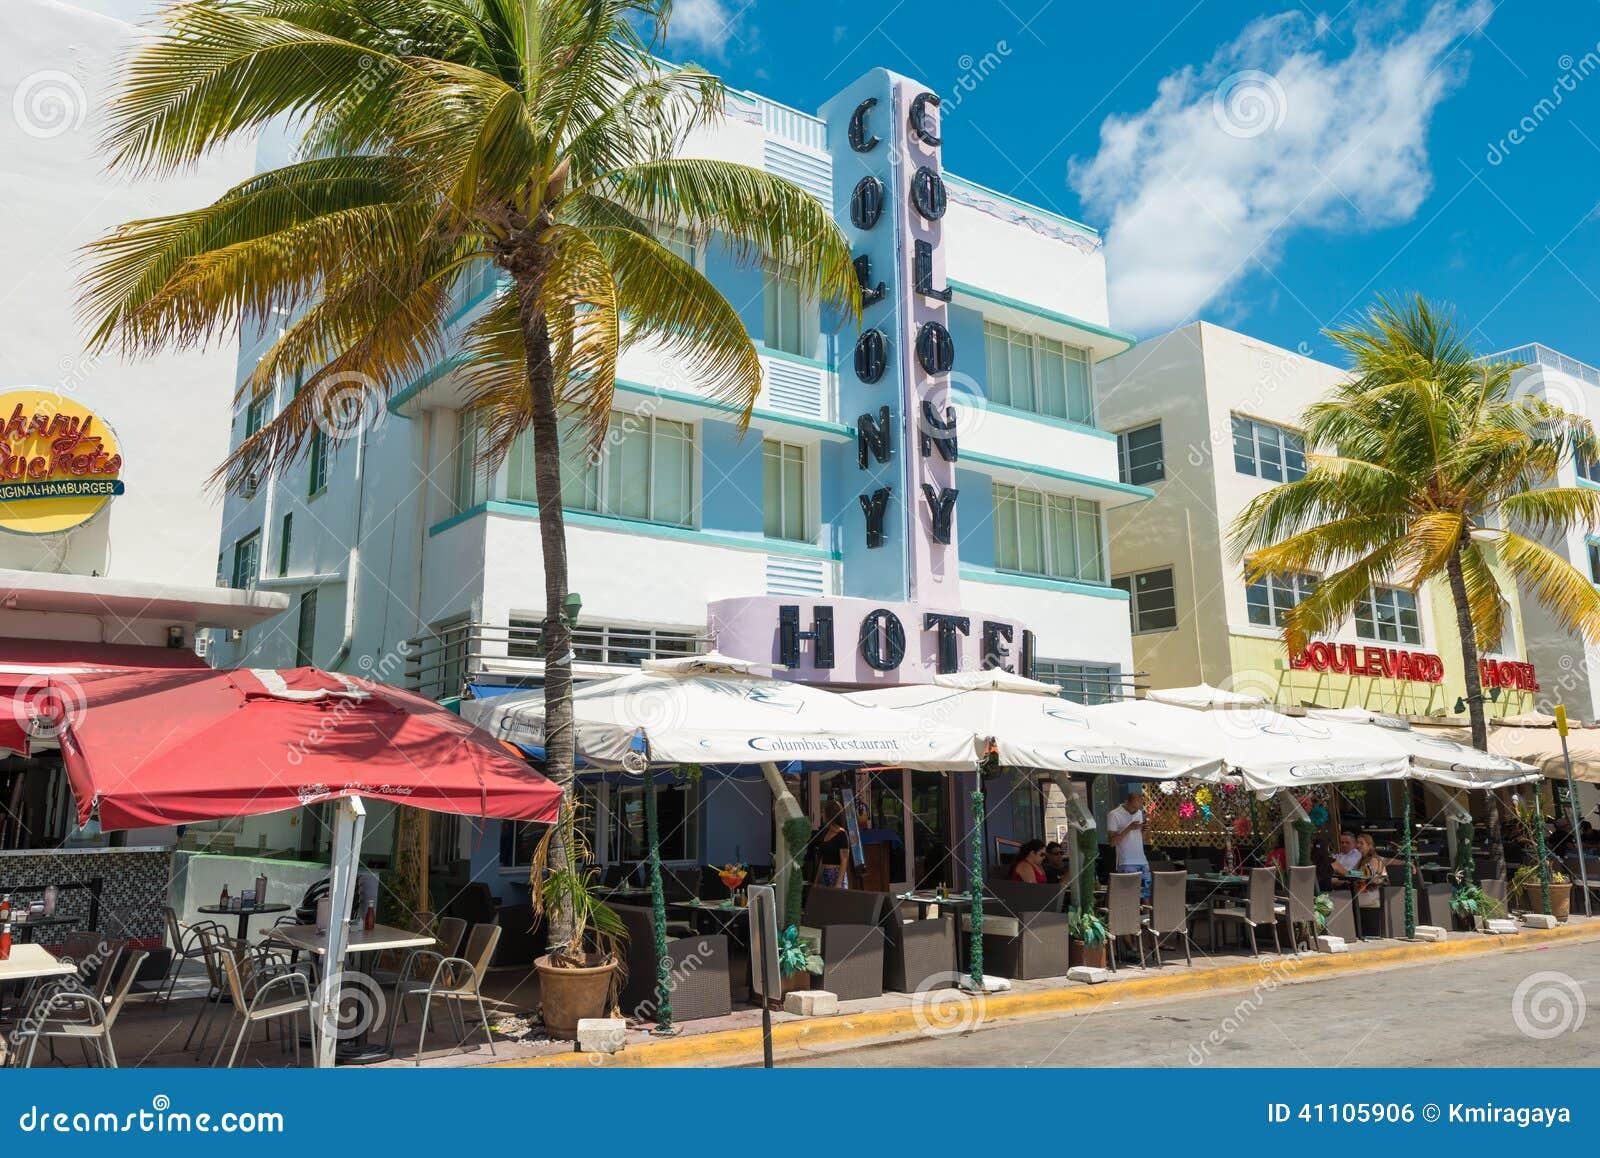 South Beach Miami Advertisements